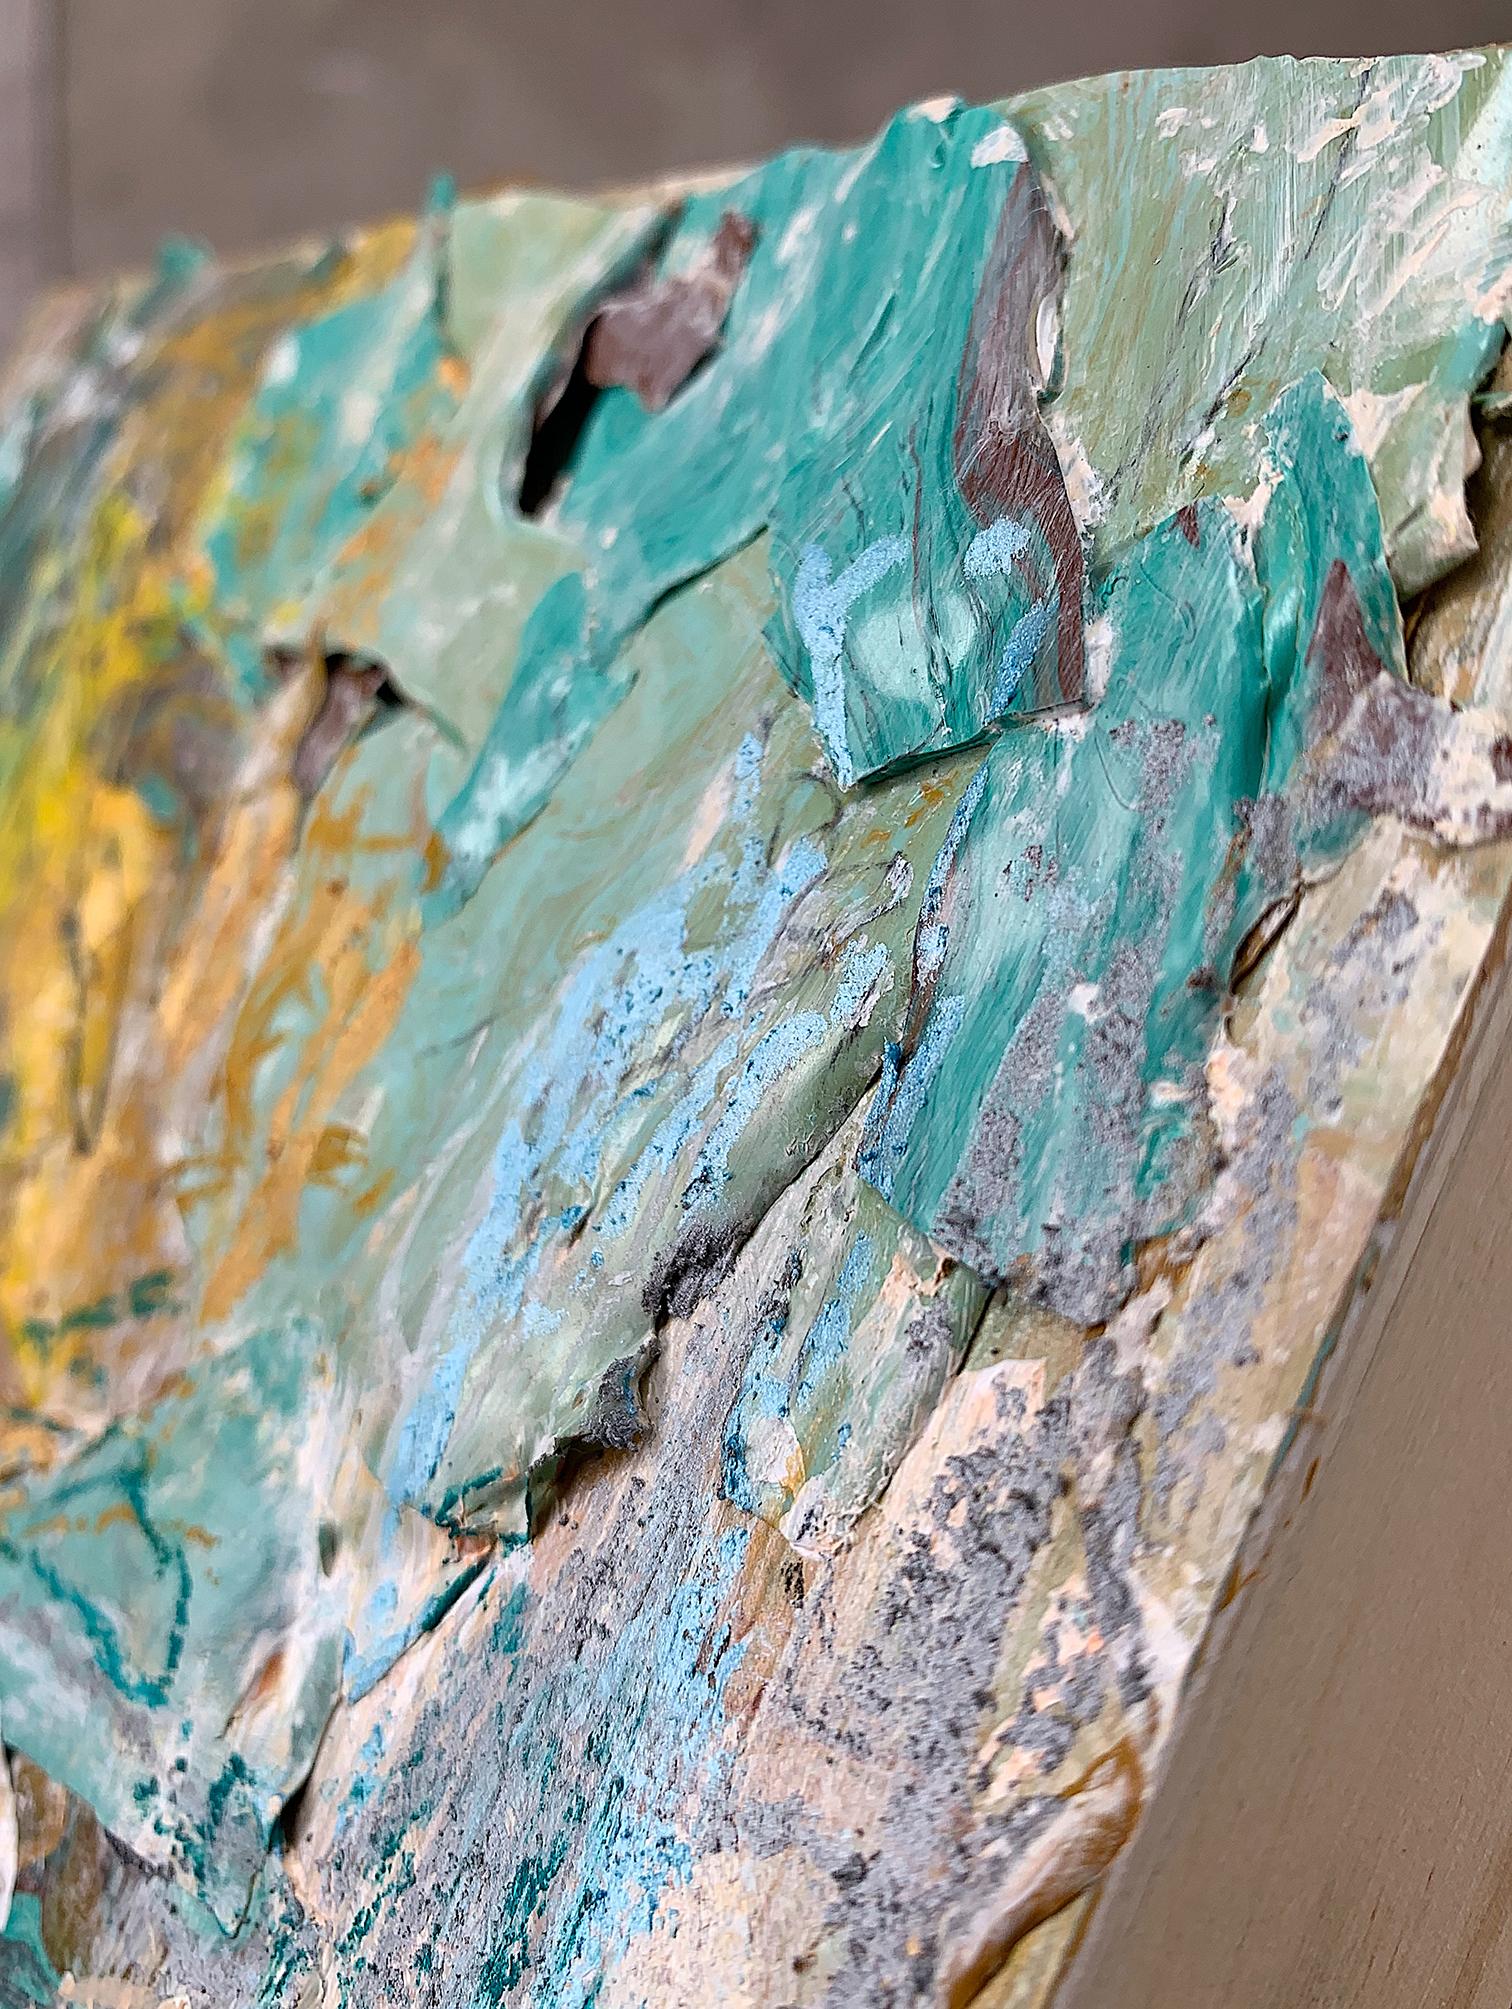 sheila-burgos-mixmedia-art-salinas-detail-2.jpg